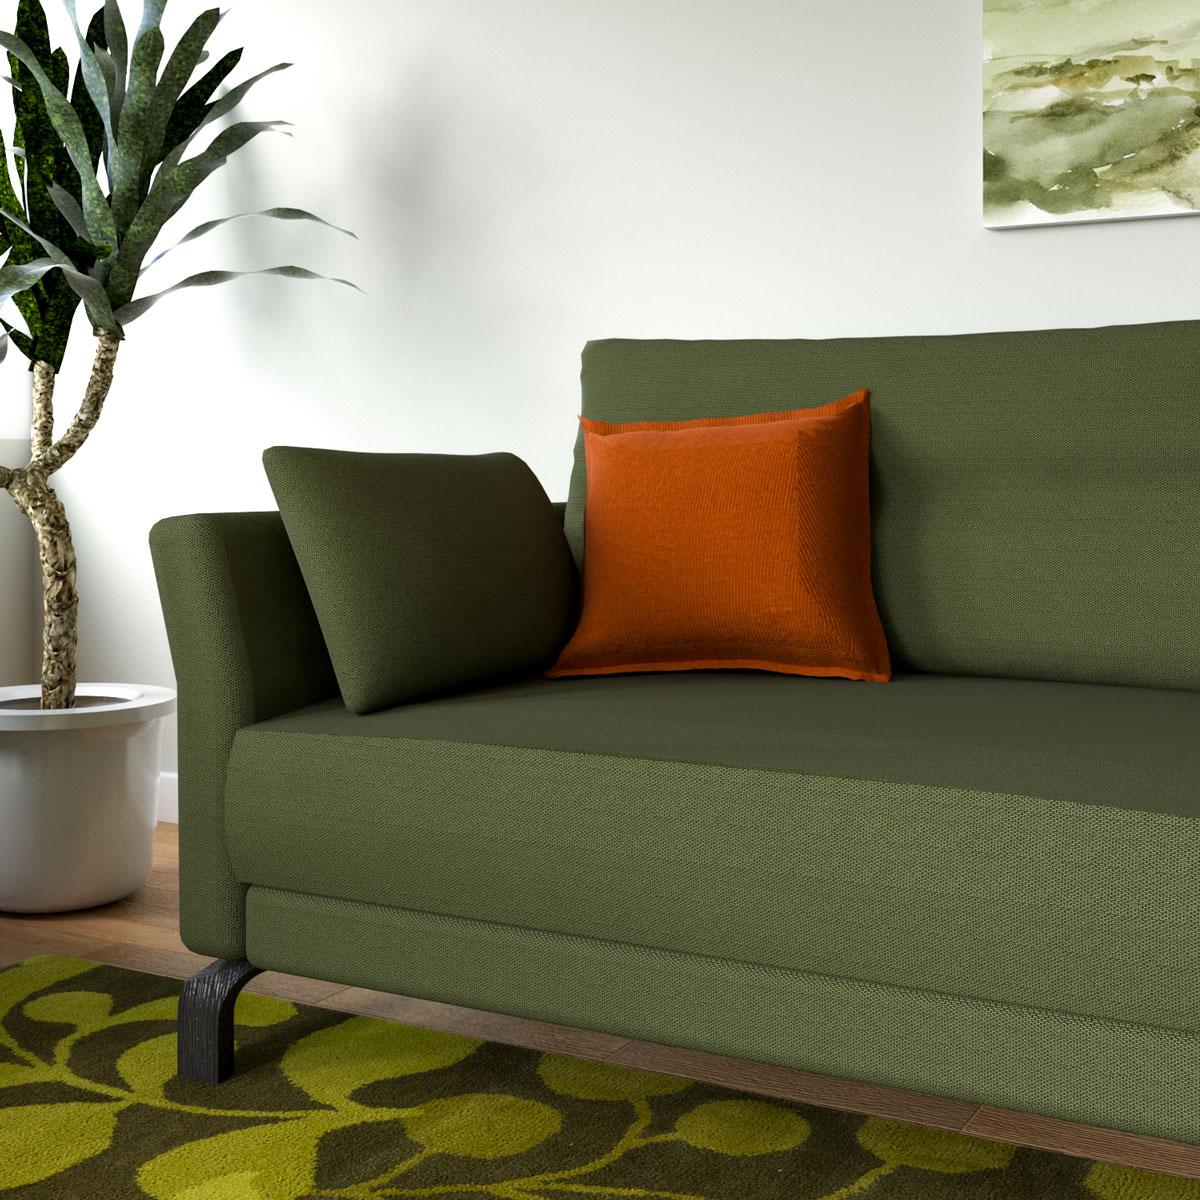 Orange throw pillow in olive green sofa